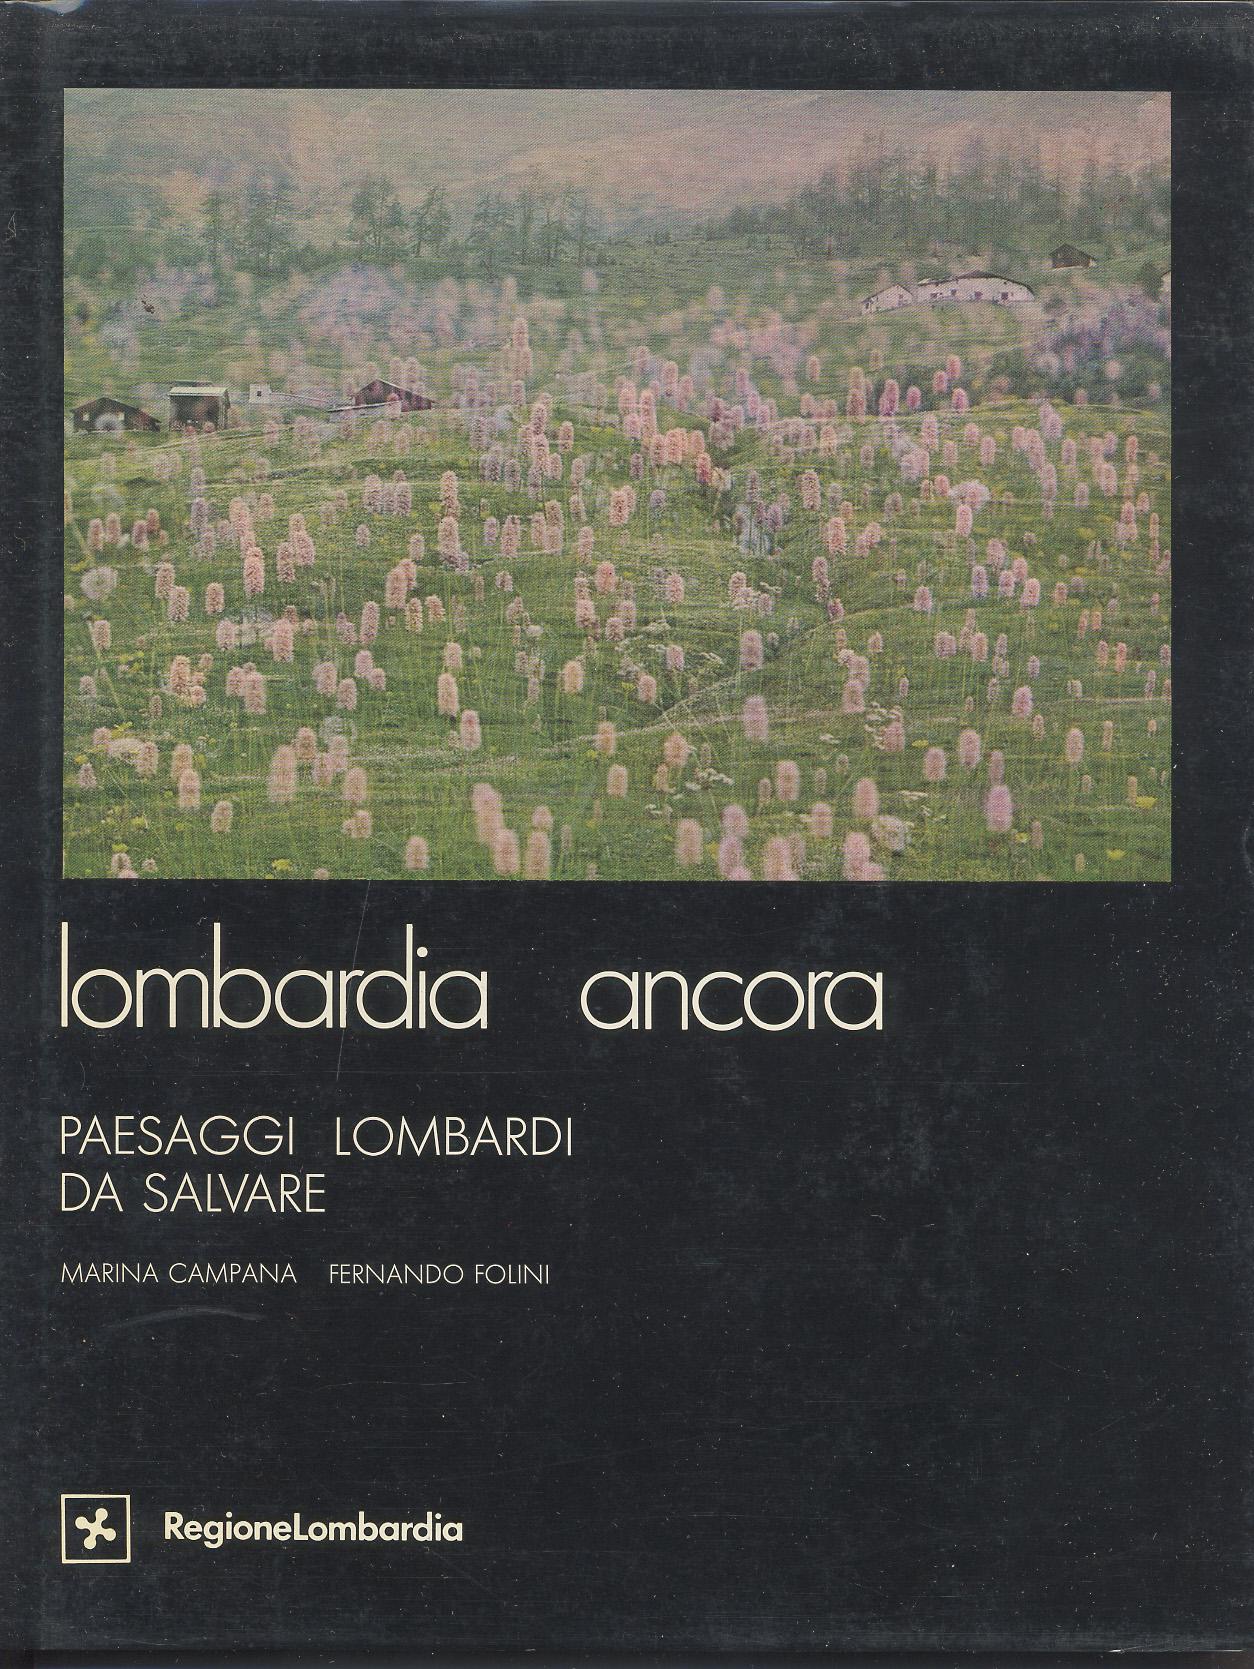 Lombardia ancora